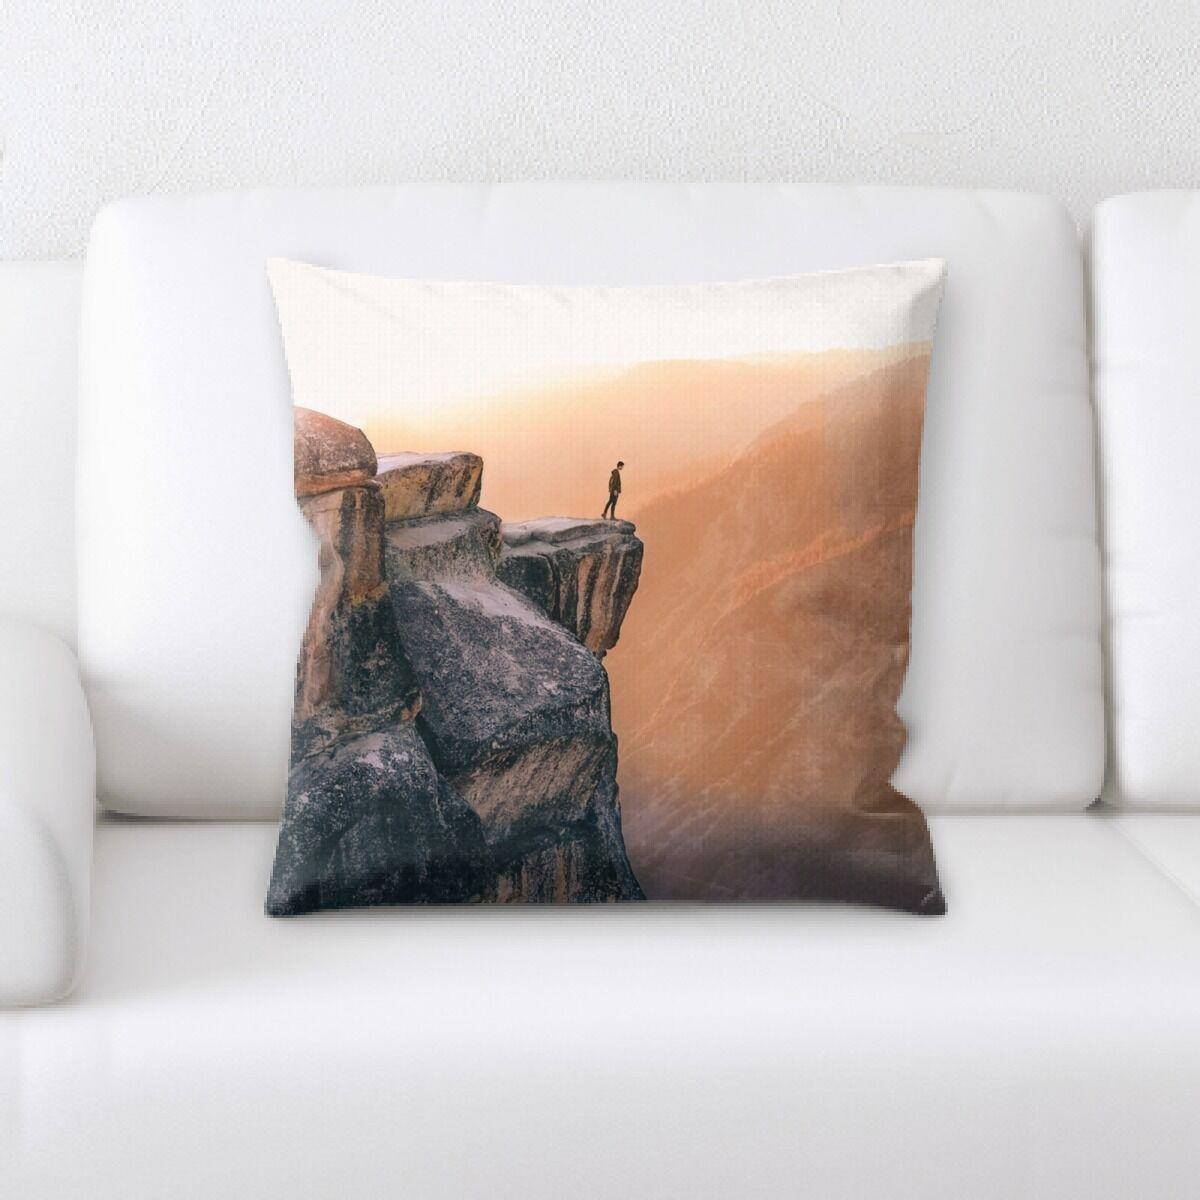 Eveloe Mountain and Cliffs (134) Throw Pillow